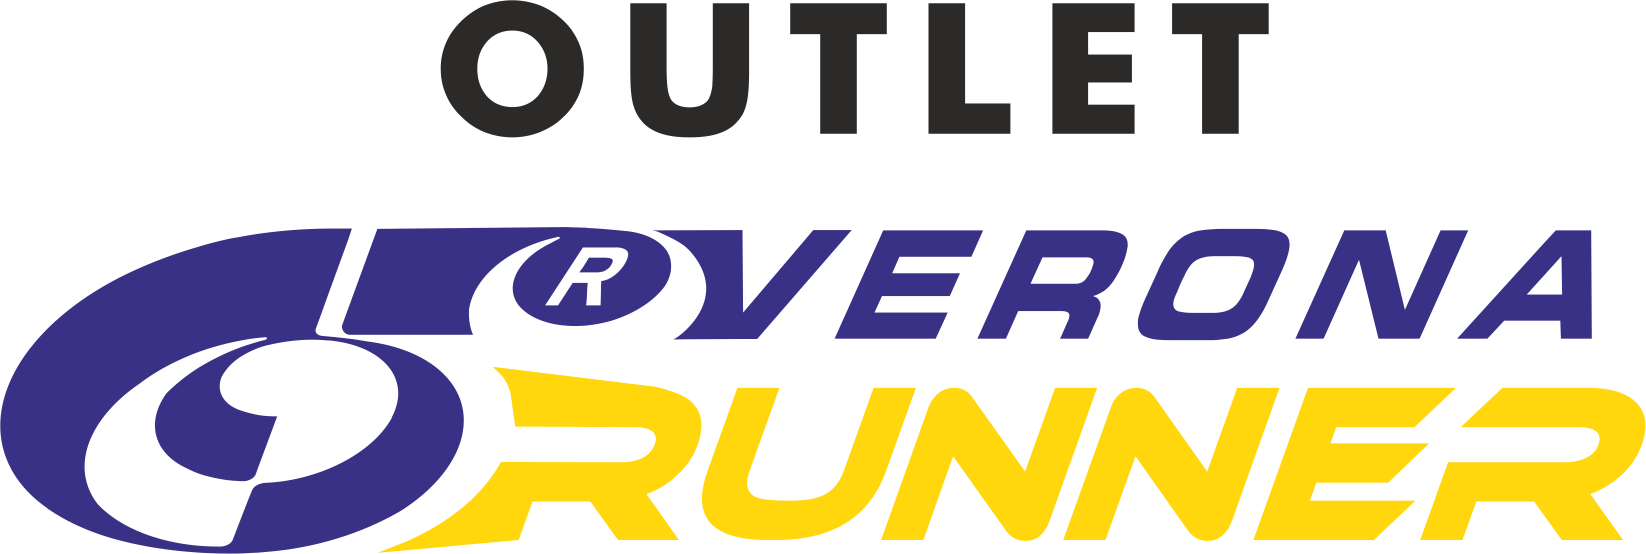 logo-outlet-verona-runner